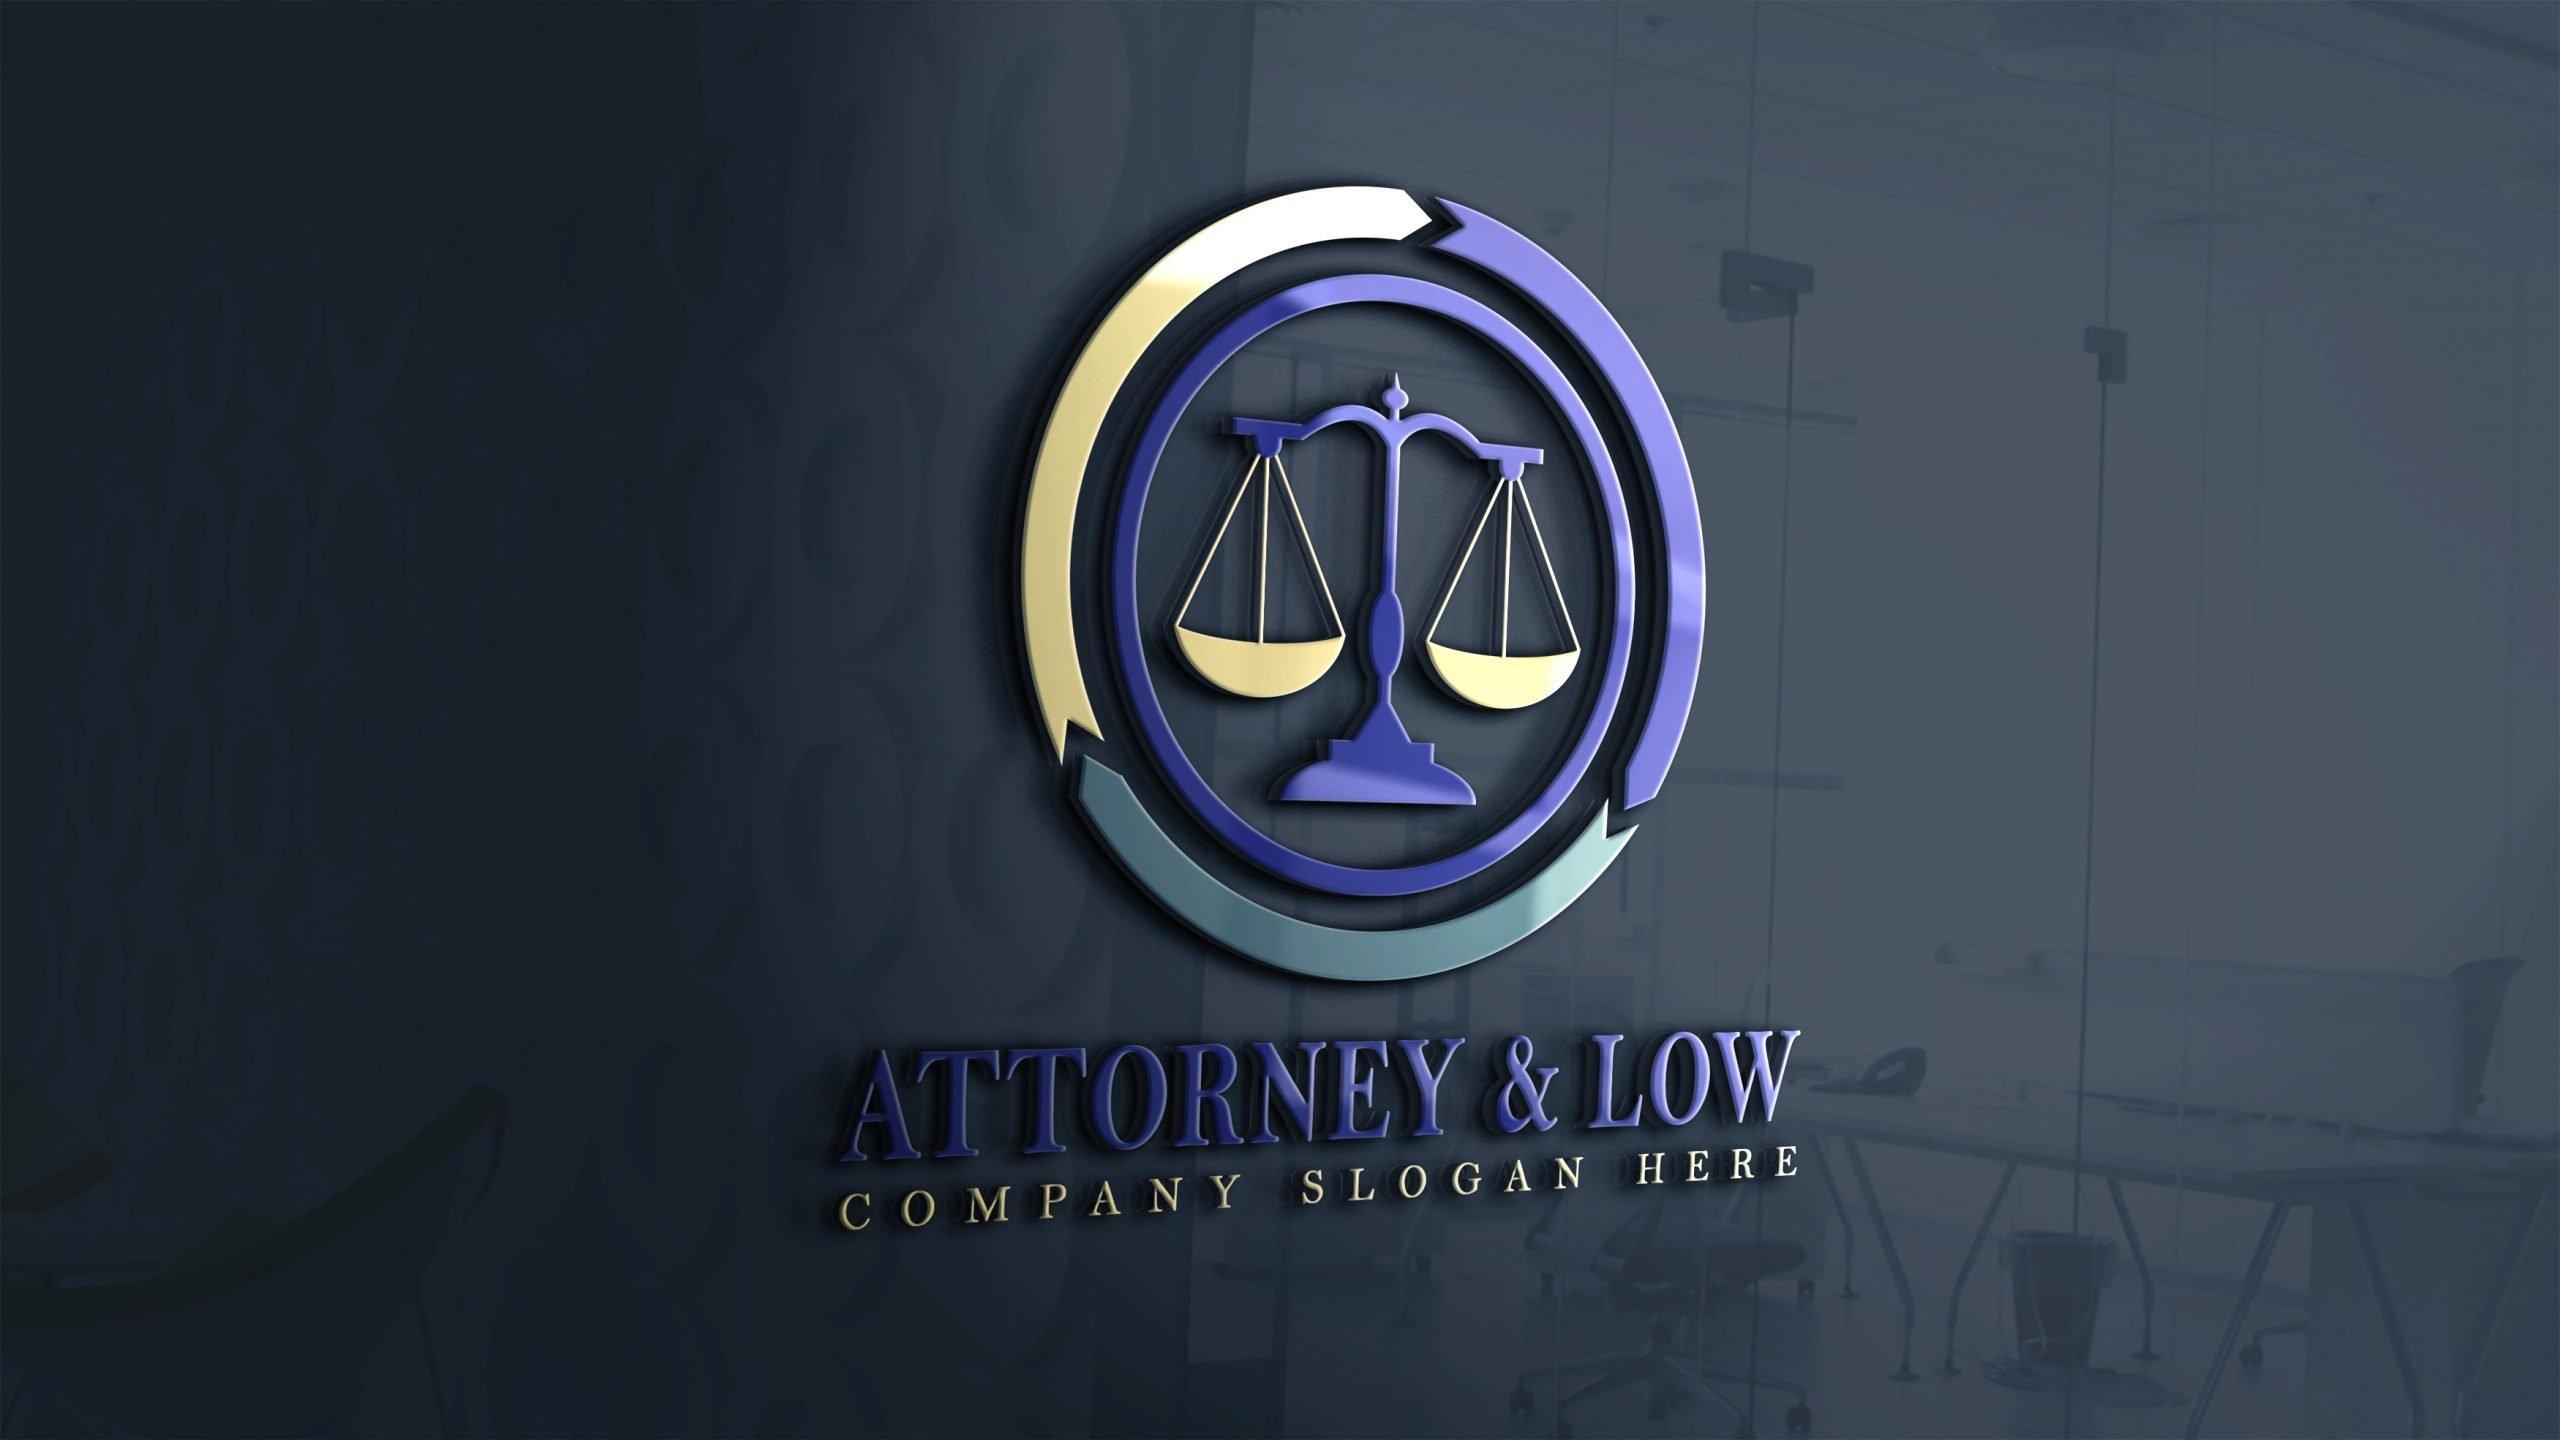 Attorney & Law Logo Design on 3d glass window